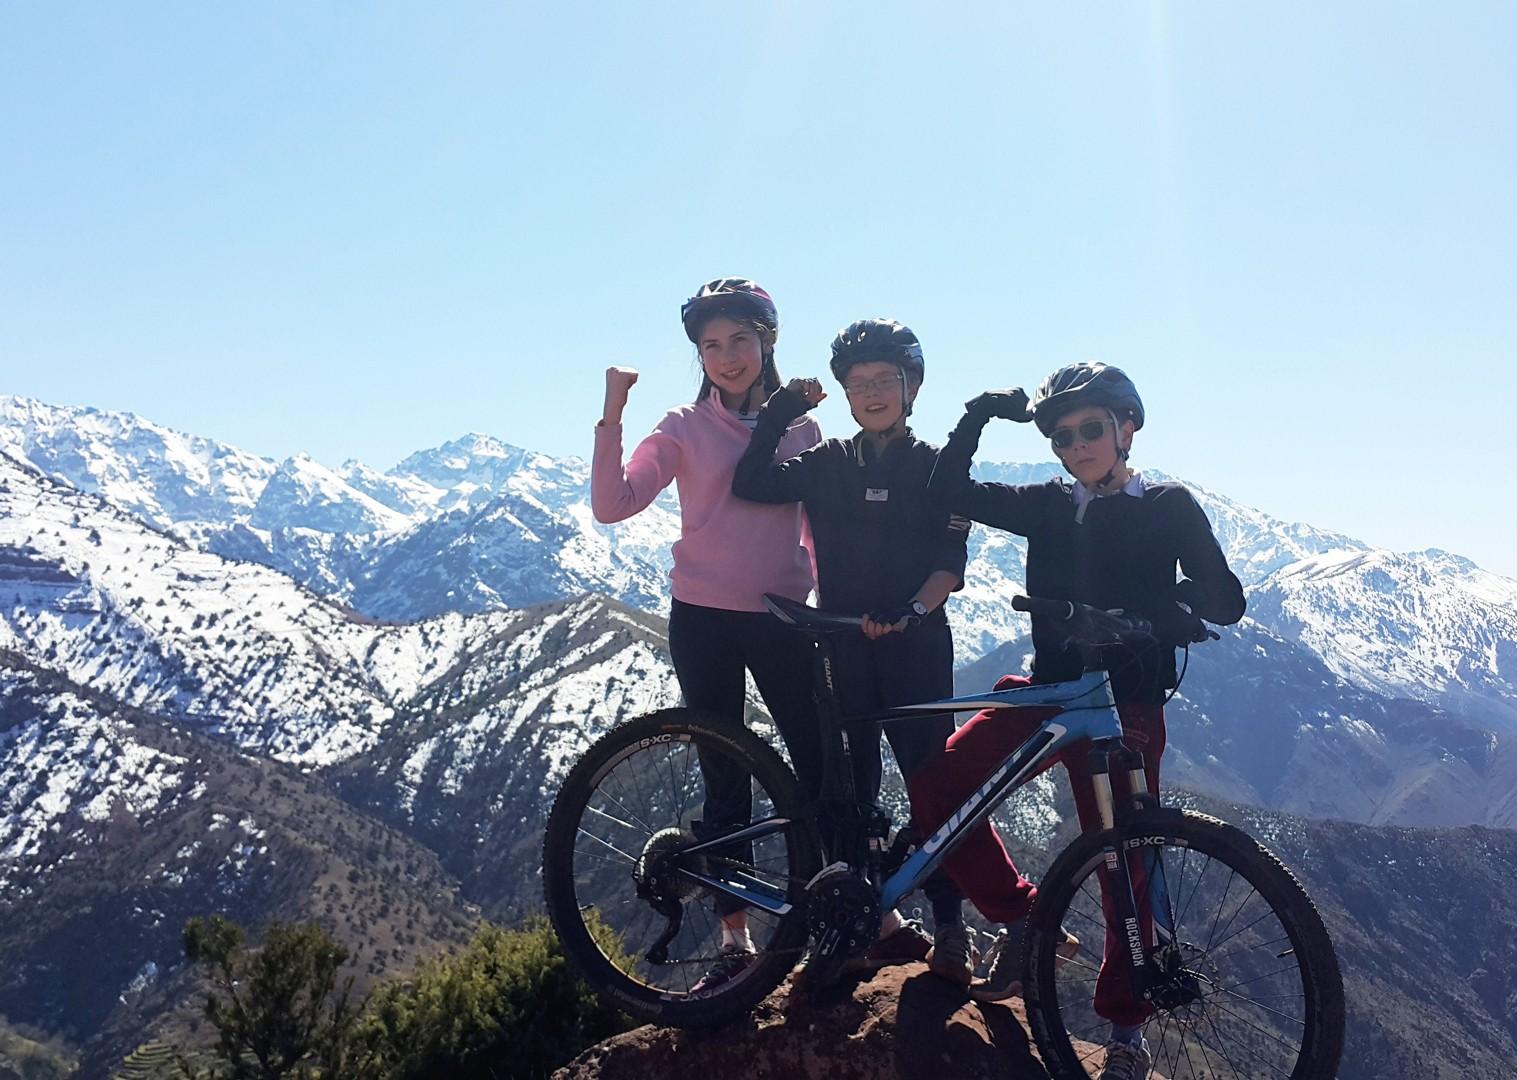 Family-Cycling-Holiday-Morocco-Desert-Mountains-Coast-biking-top-of-the-mountain - Morocco - Desert, Mountains and Coast - Family Cycling